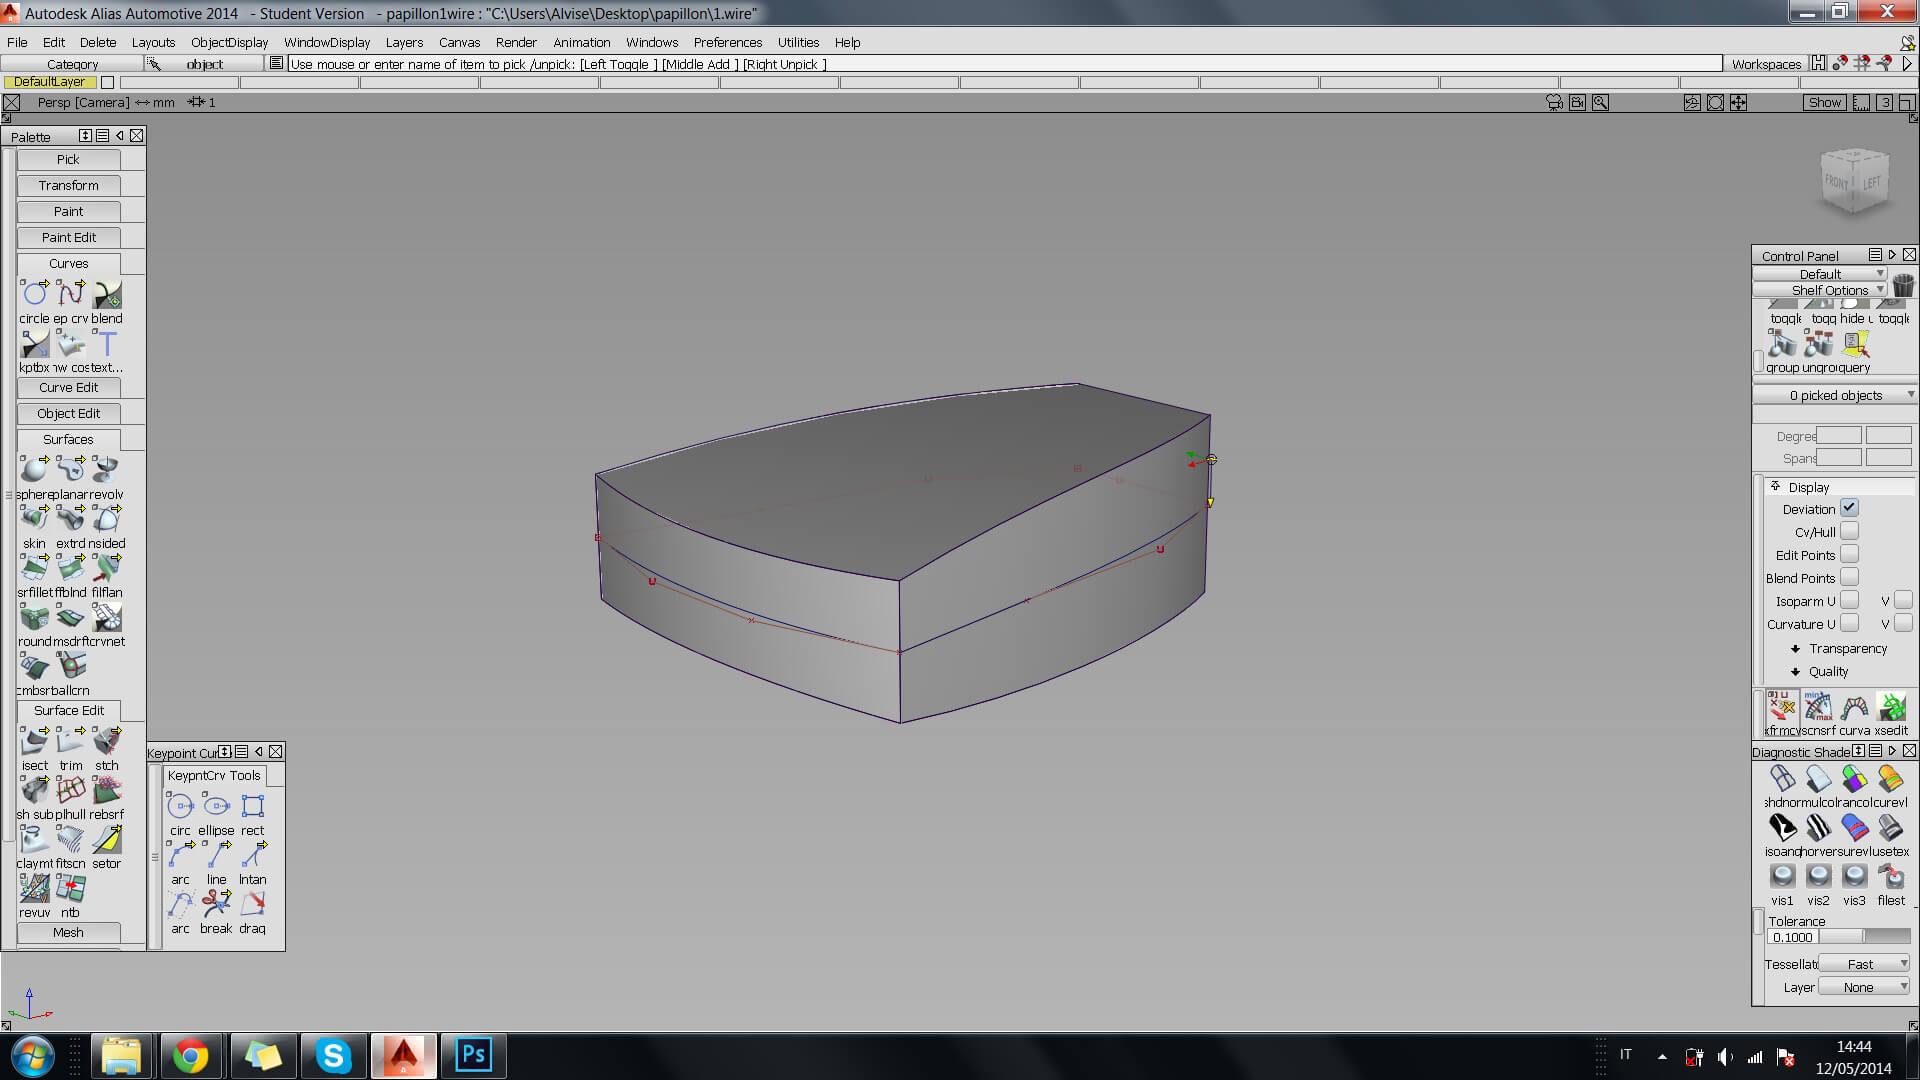 Autodesk Alias Tutorial: 3D Modeling for 3D printing with Autodesk Alias